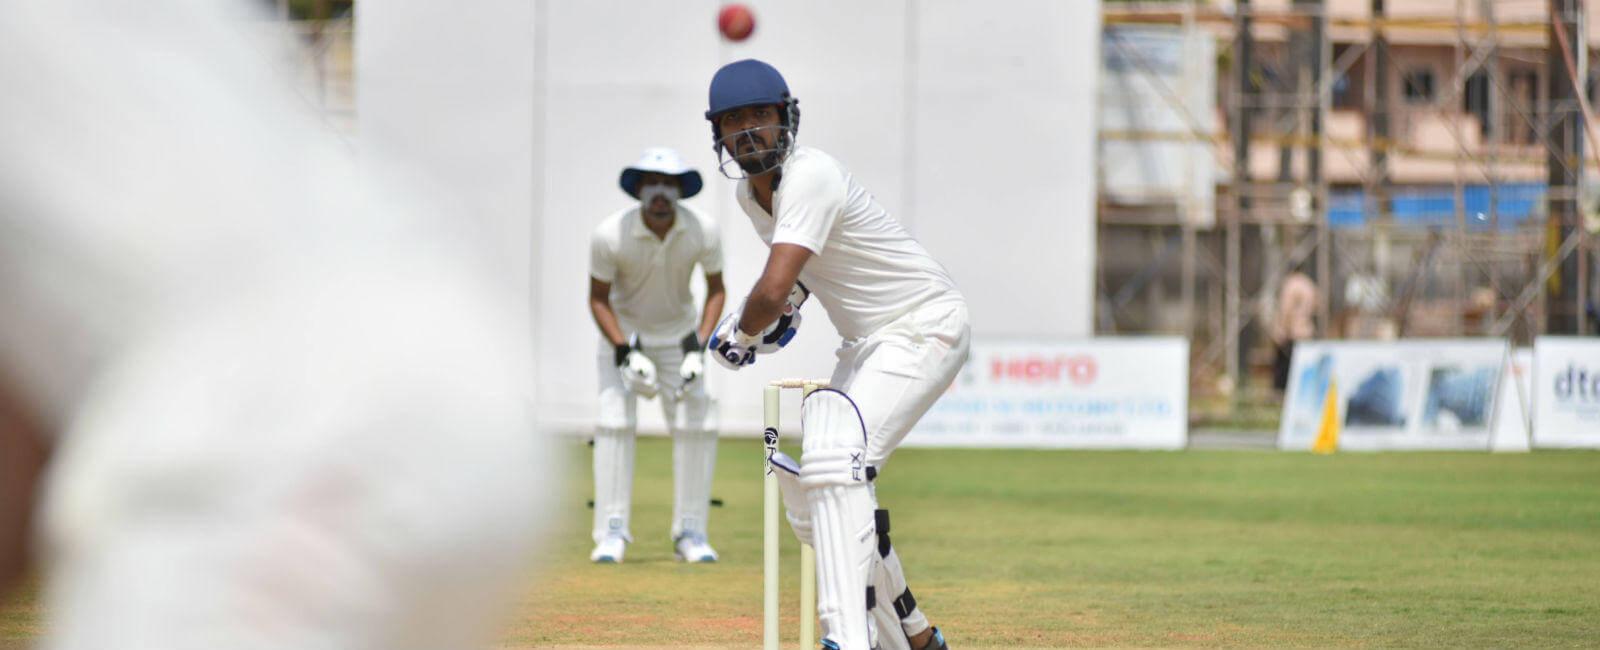 Cricket Batting Techniques and Tips - Blog Decathlon